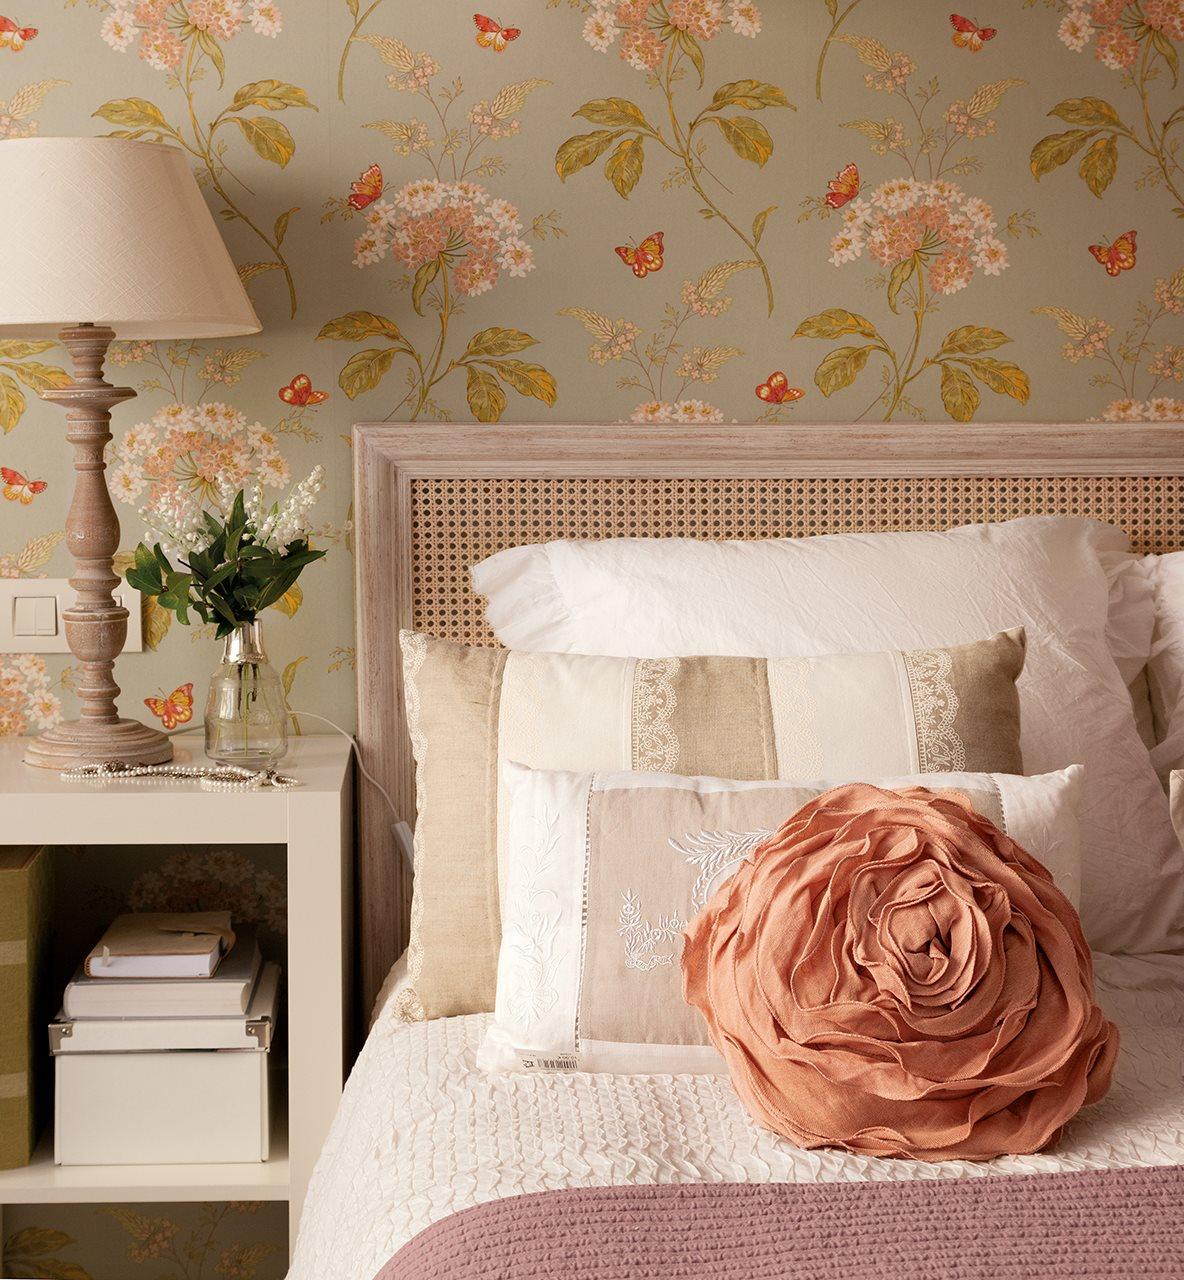 Diez cabeceros distintos adecuados para diferentes necesidades for Cabeceros de cama con papel pintado